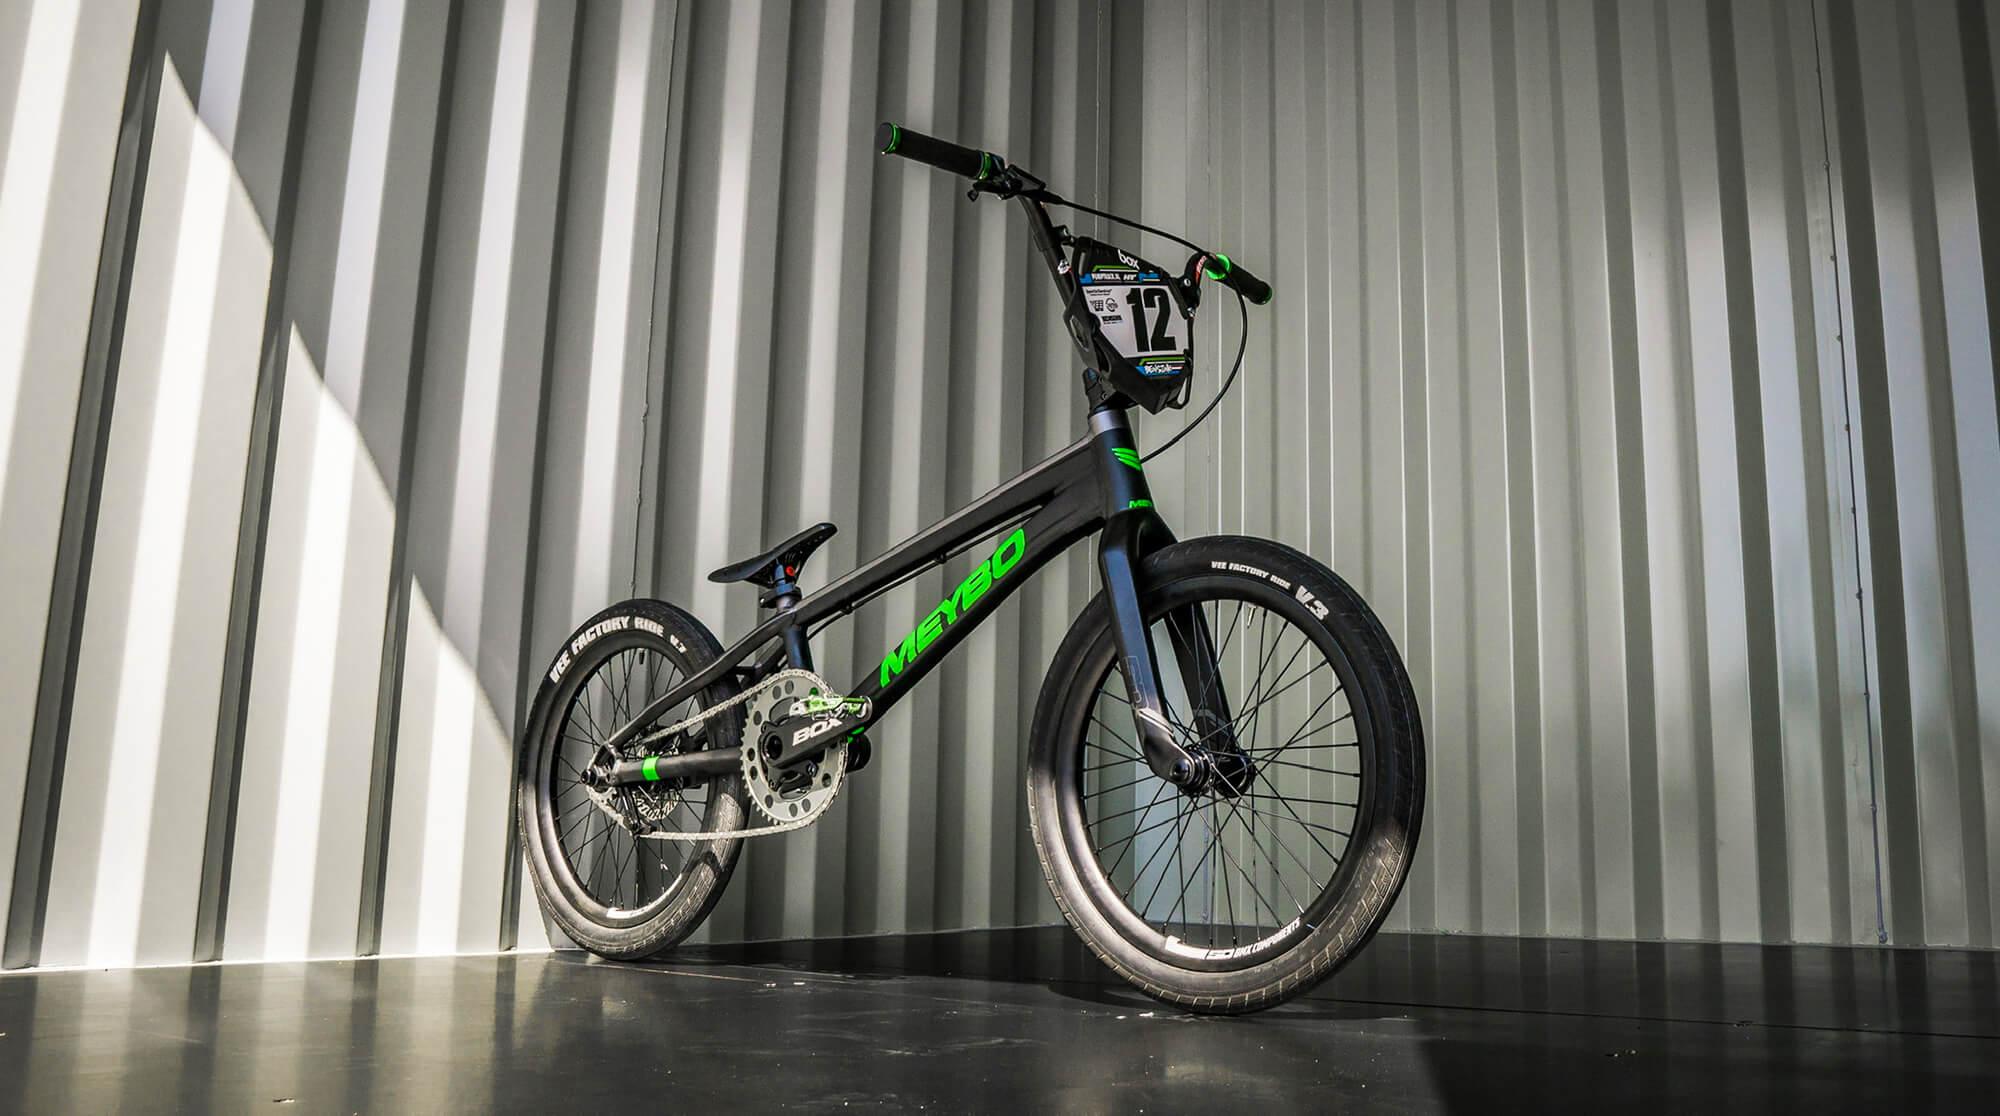 Team Oegema TVE Bike Check 2020 - DSC02115 - Niel Bensink